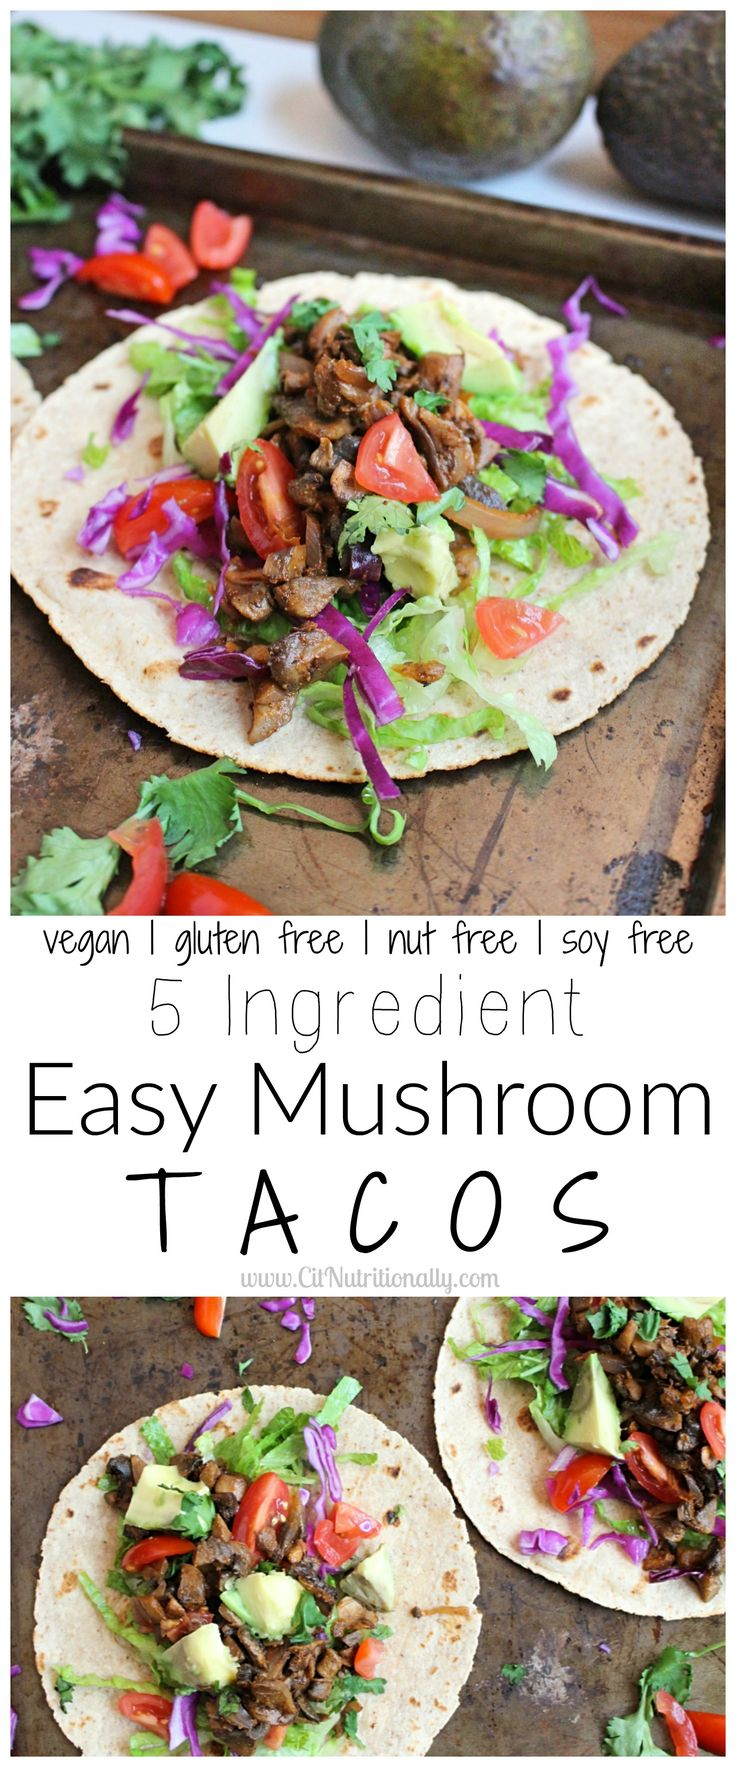 5 Ingredient Easy Mushroom Tacos {Vegan. Gluten free.}   C it Nutritionally